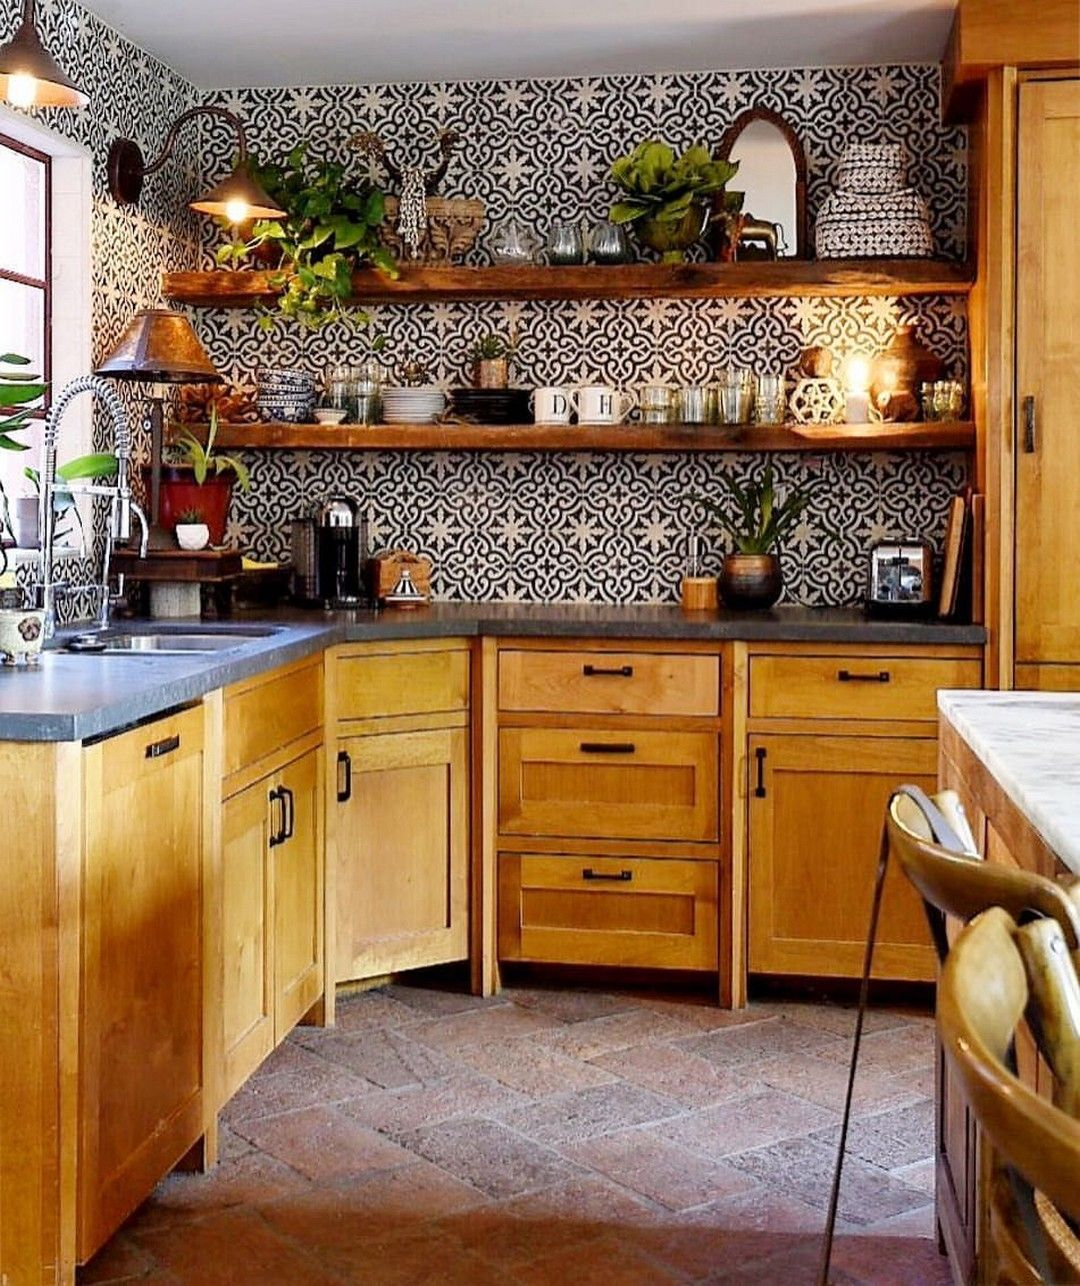 29 Design Ideas for Boho Style Kitchens images